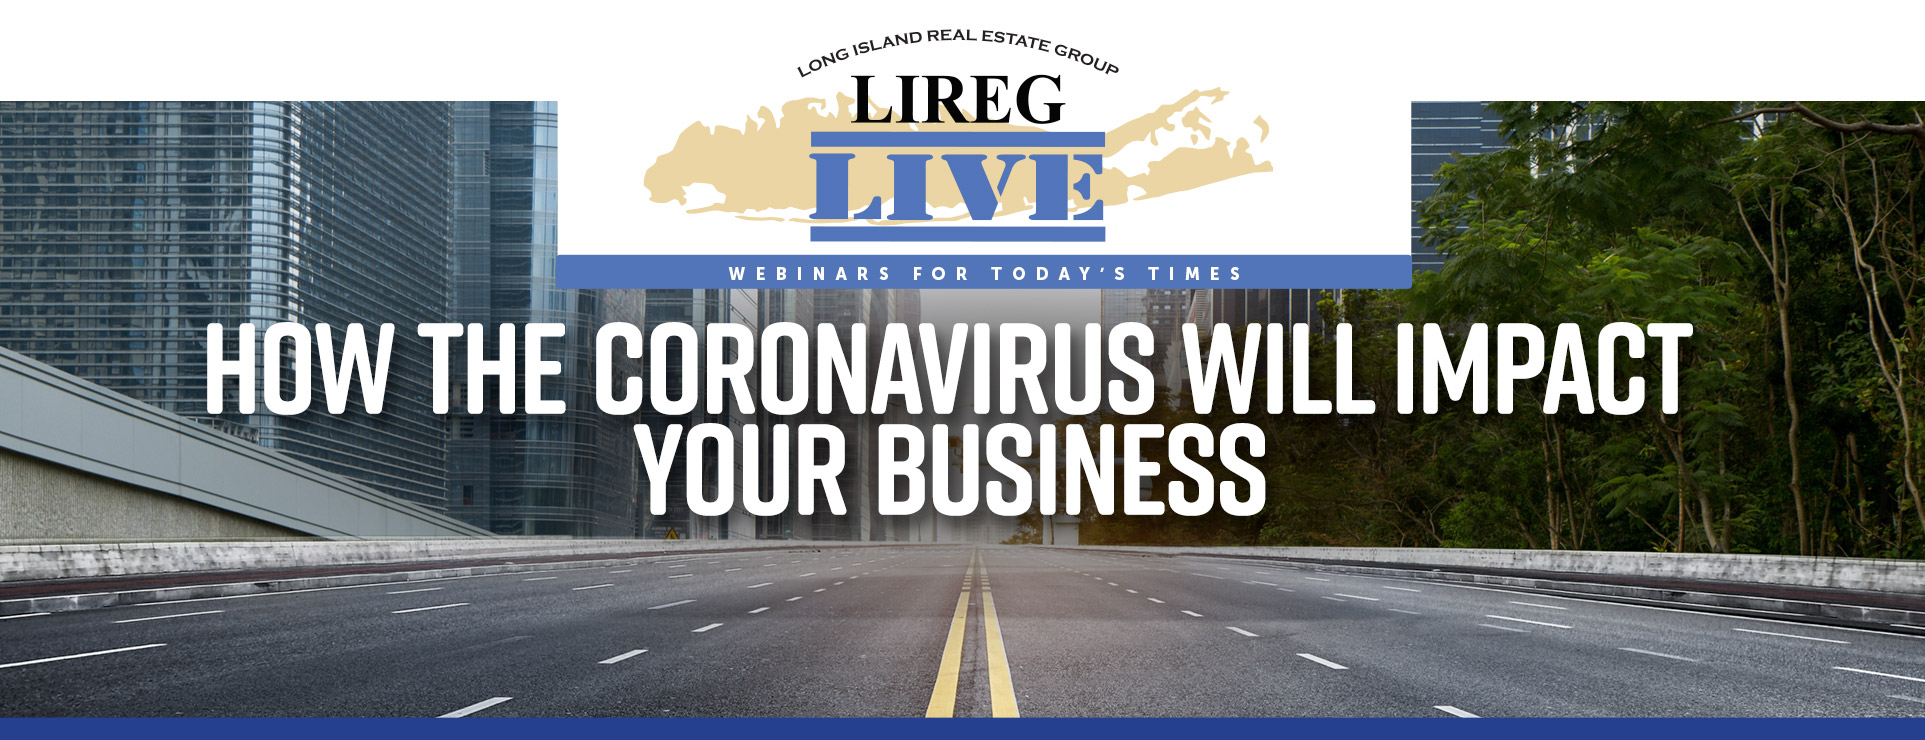 HOW THE CARONAVIRUS WILL IMPACT YOUR BUSINESS